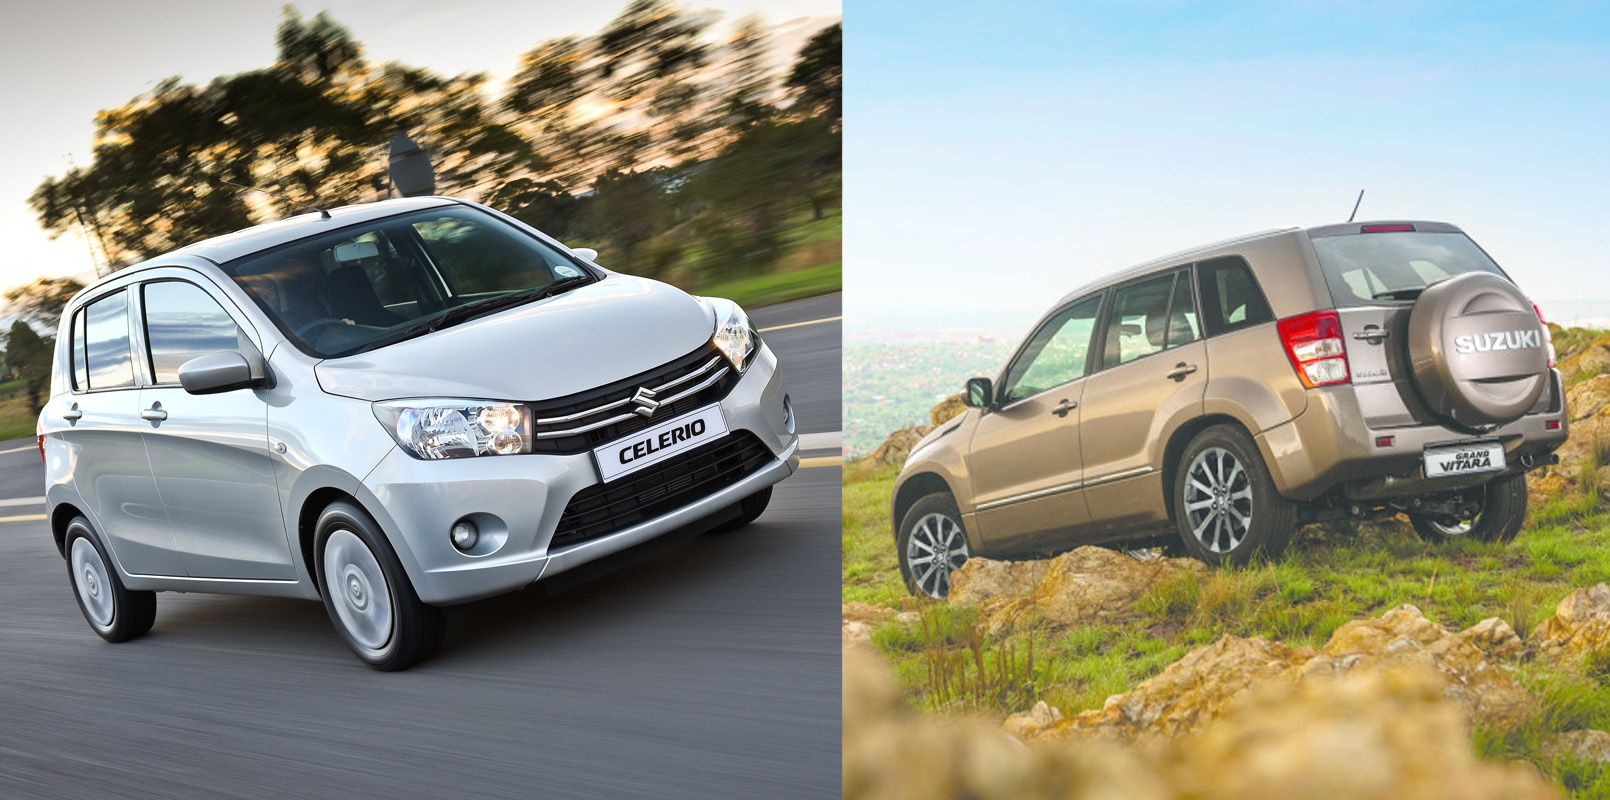 Suzuki Auto South Africa | Suzuki Celerio vs. Suzuki Grand Vitara